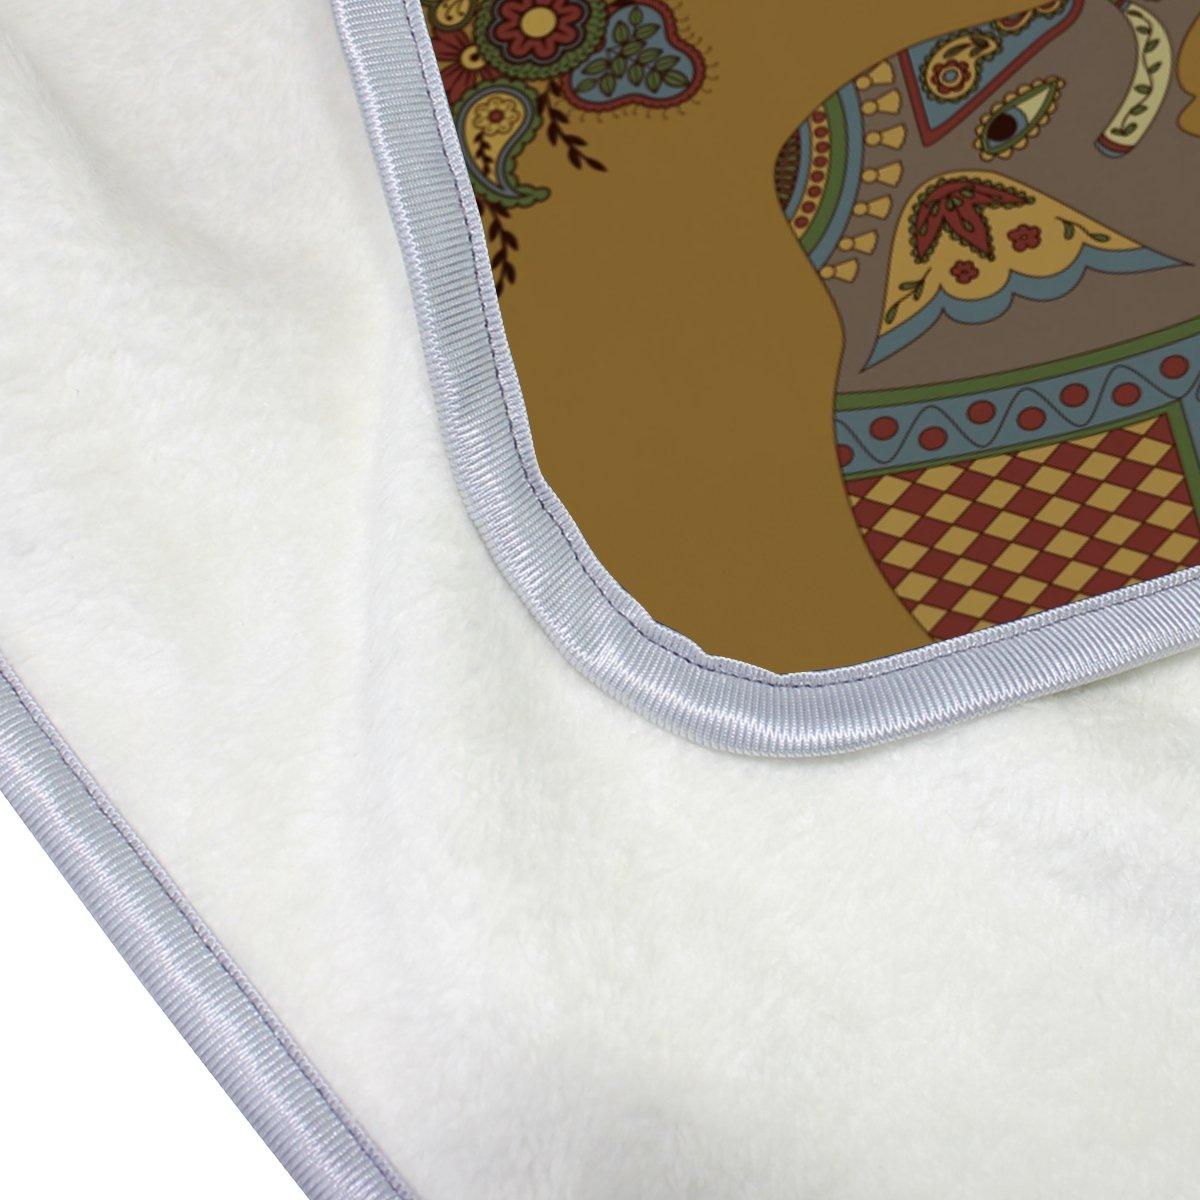 Vantaso Soft Blankets Throw India Mandala Elephants Microfiber Polyester Blankets for Bedroom Sofa Couch Living Room for Kids Children Girls Boys 60 x 90 inch by Vantaso (Image #5)